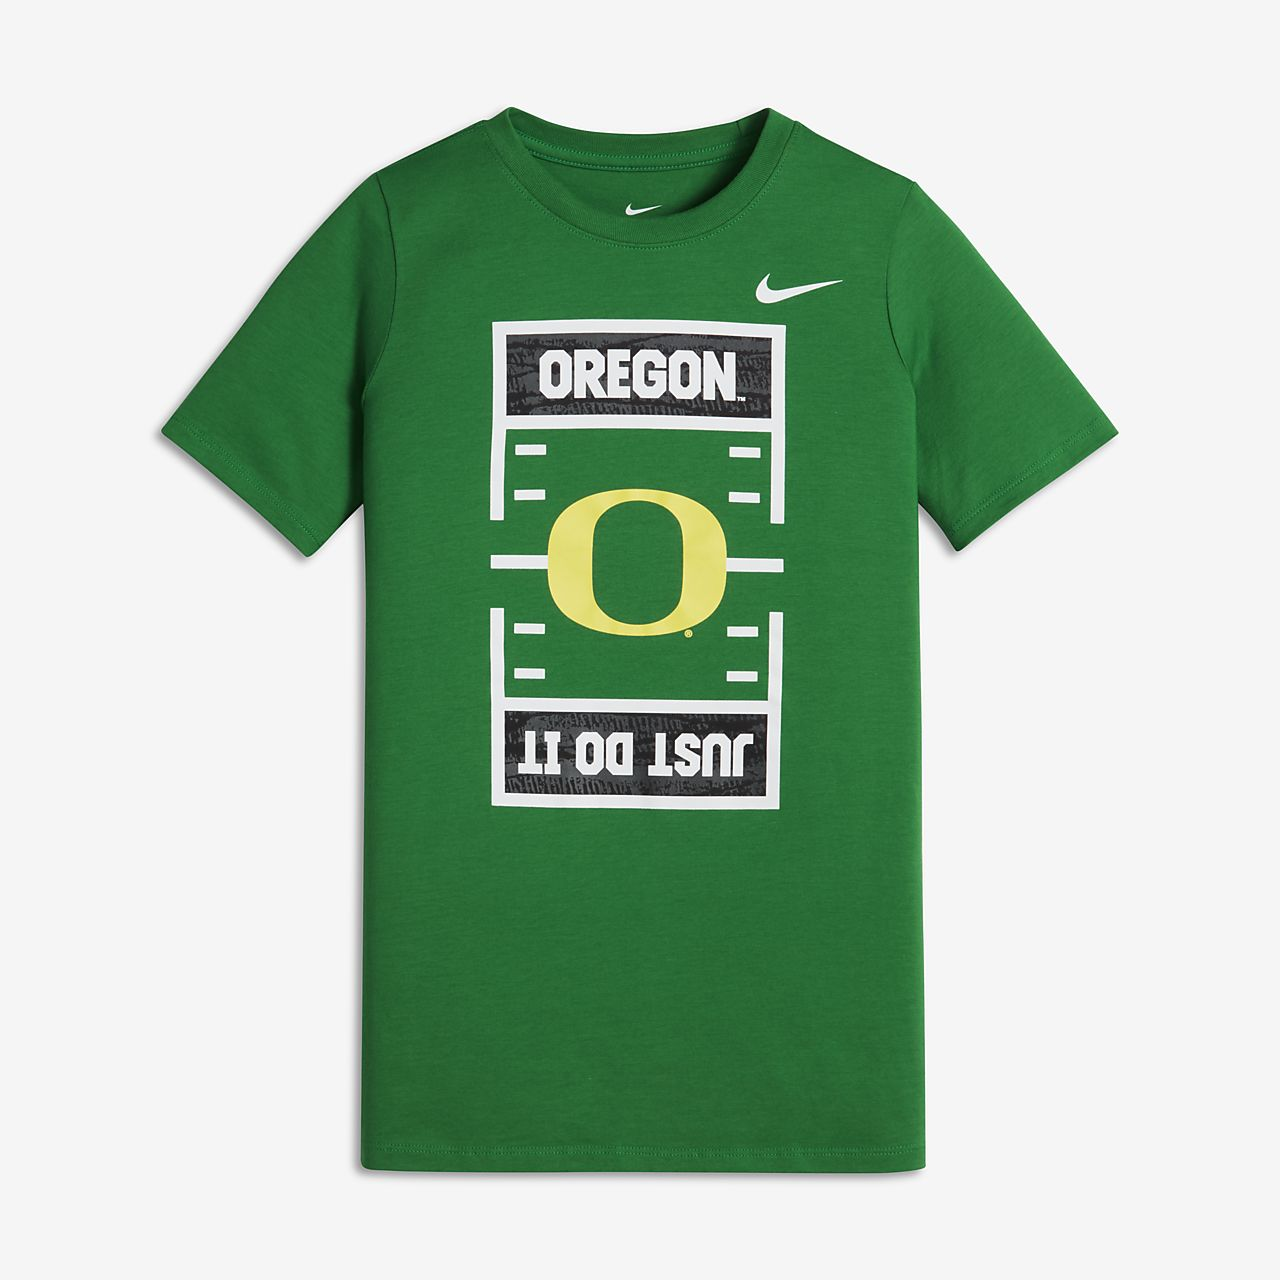 Nike college just do it oregon big kids football t shirt nike nike college just do it oregon big kids football t shirt voltagebd Gallery